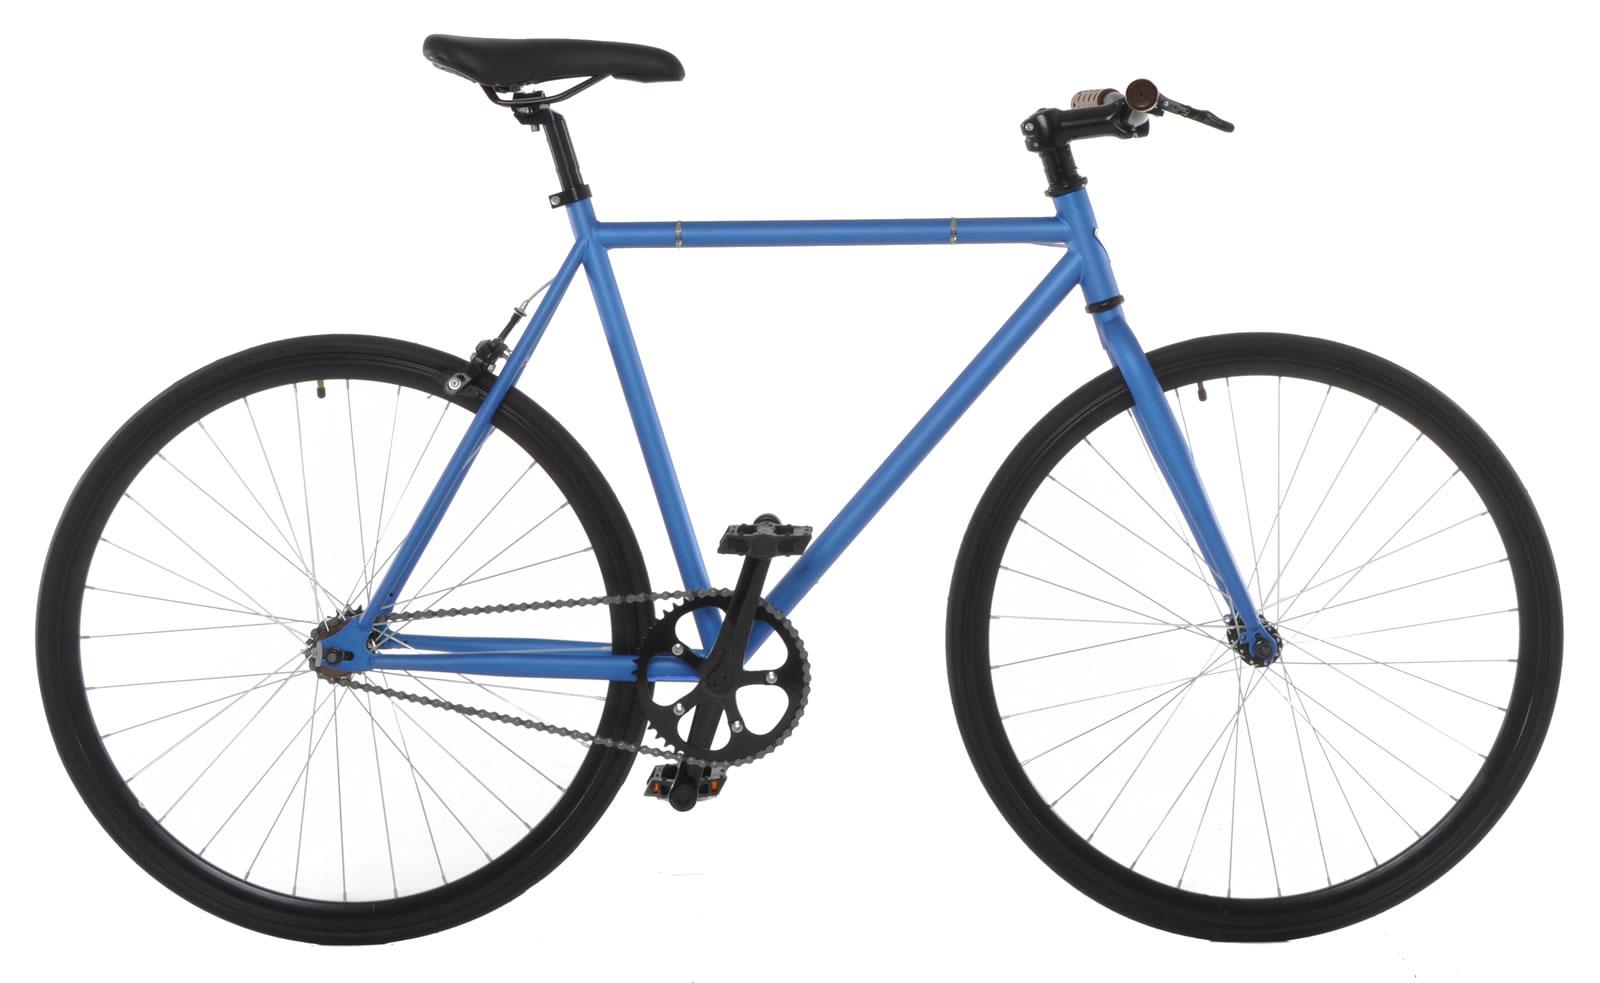 Vilano Fixed Gear Bike Fixie Single Speed Road Bike | eBay